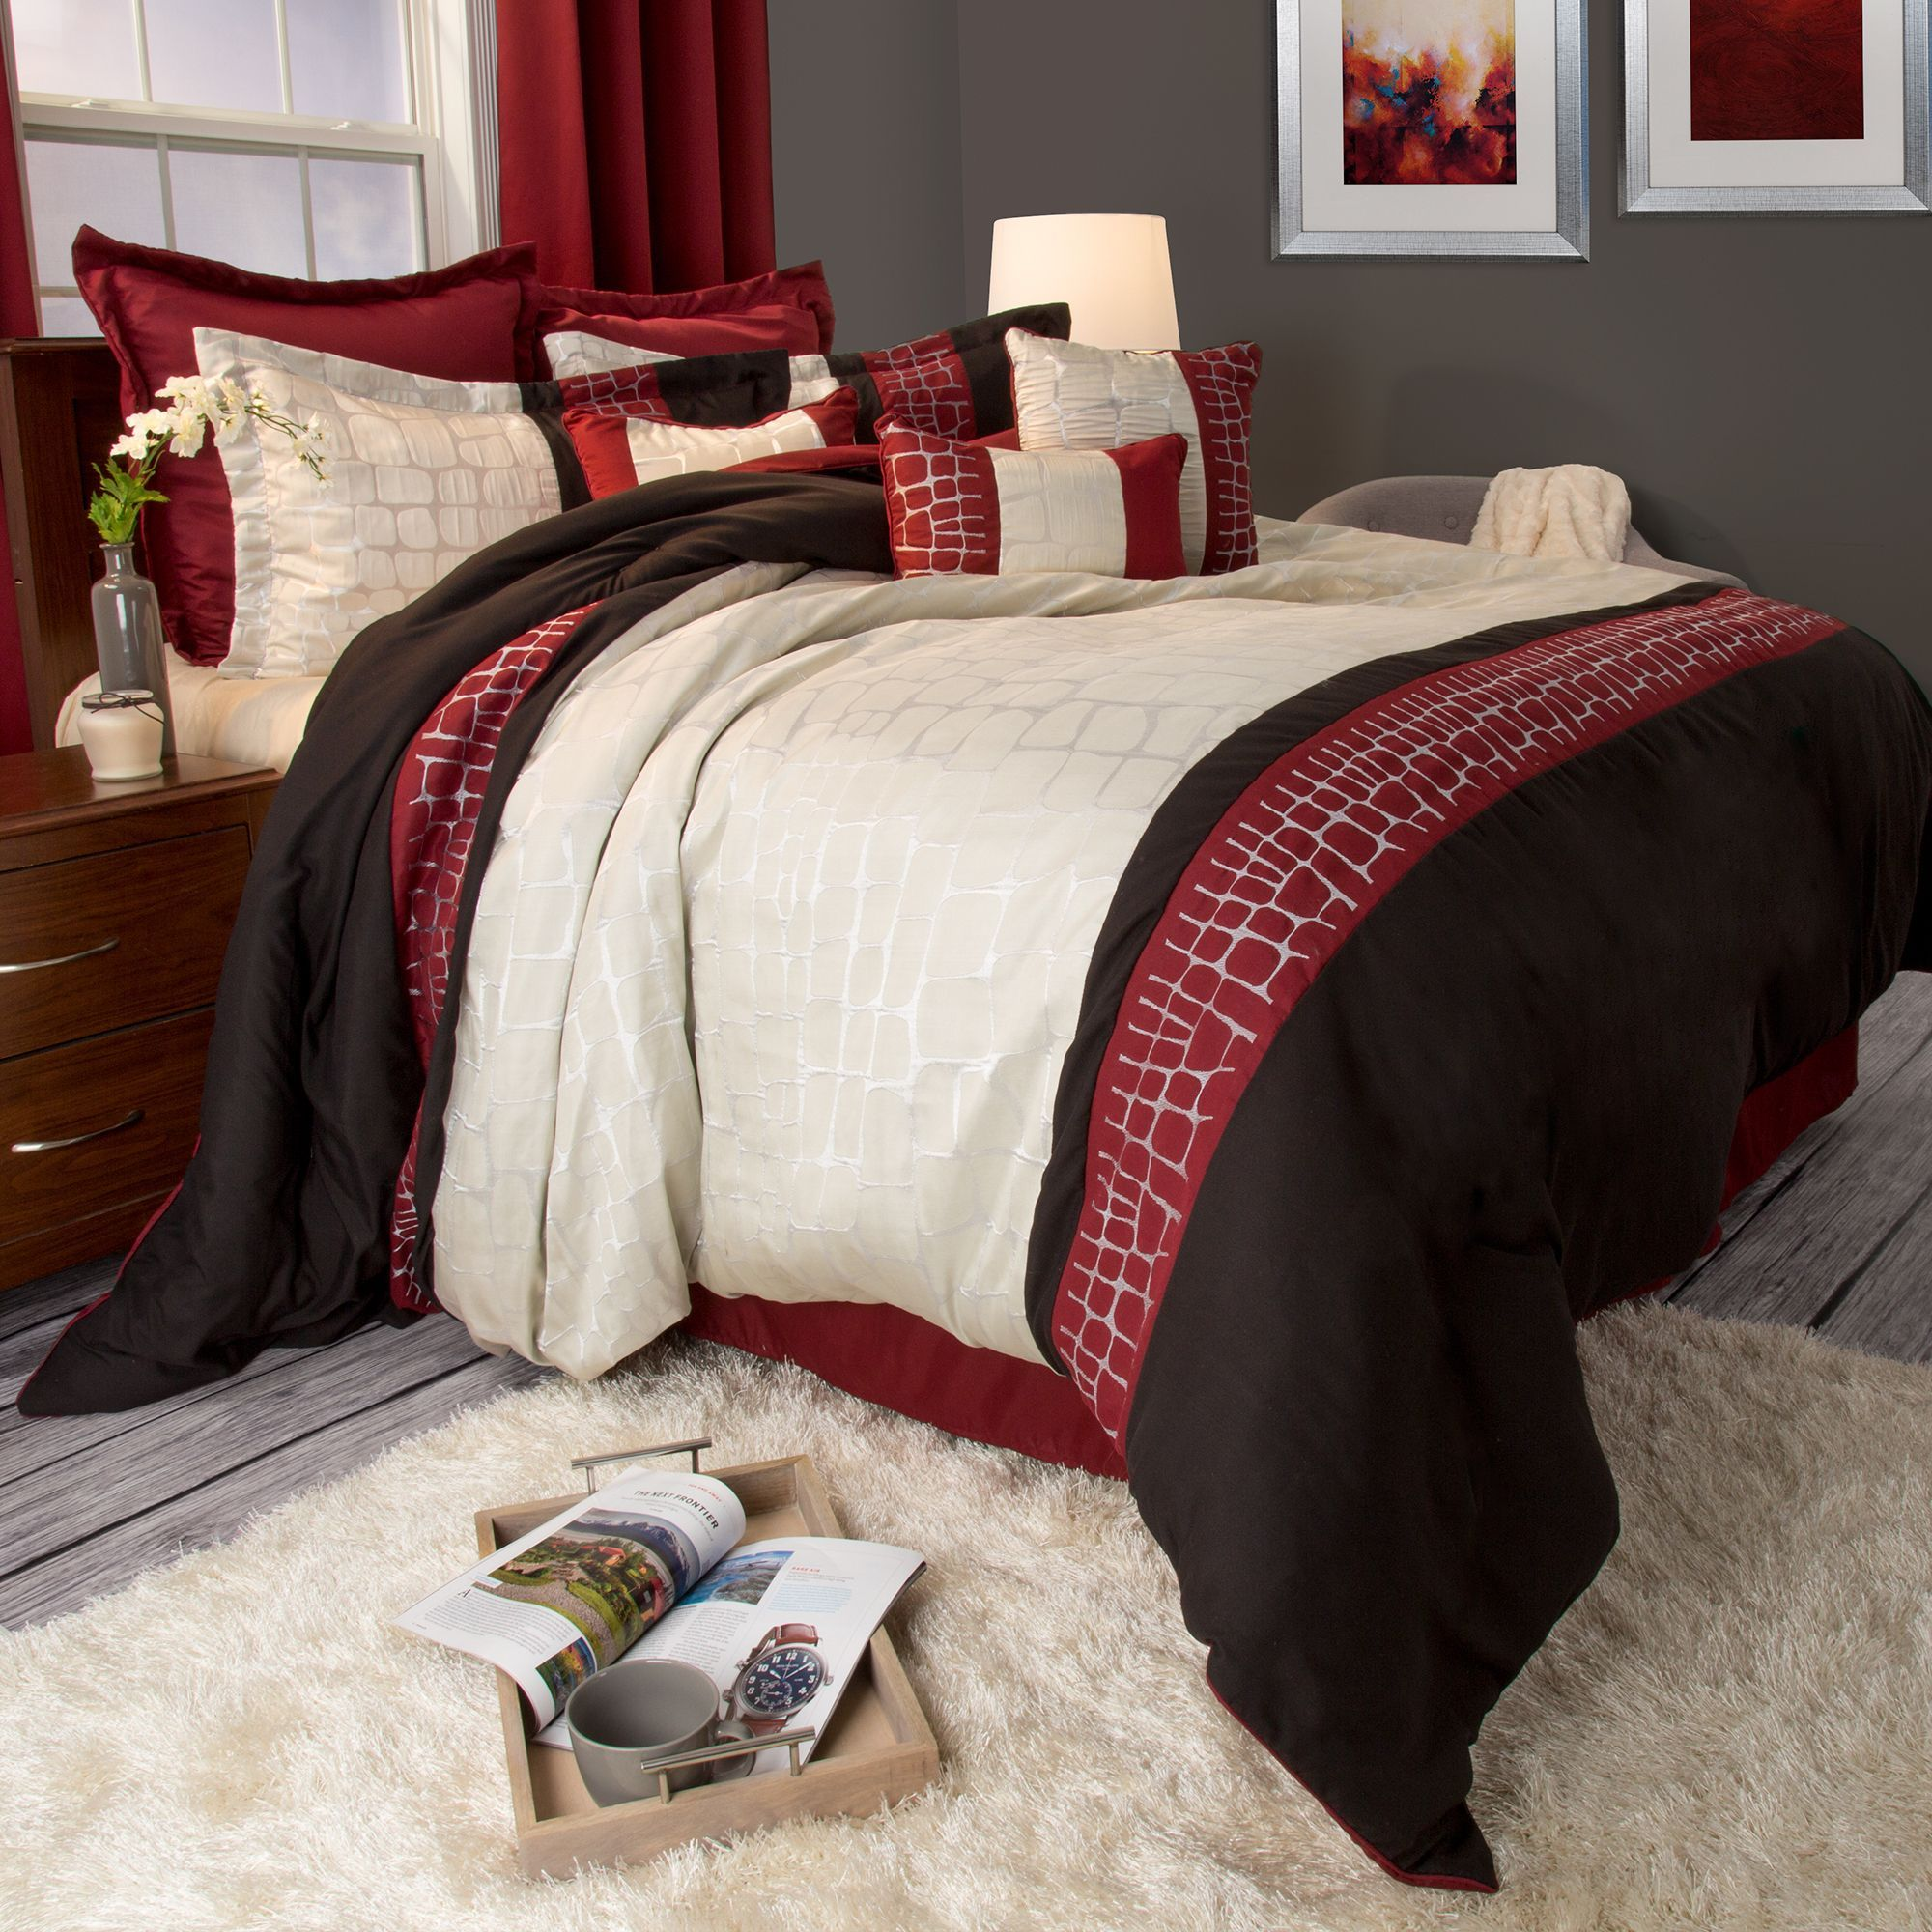 California King Comforters Bedding Guest Room Pinterest